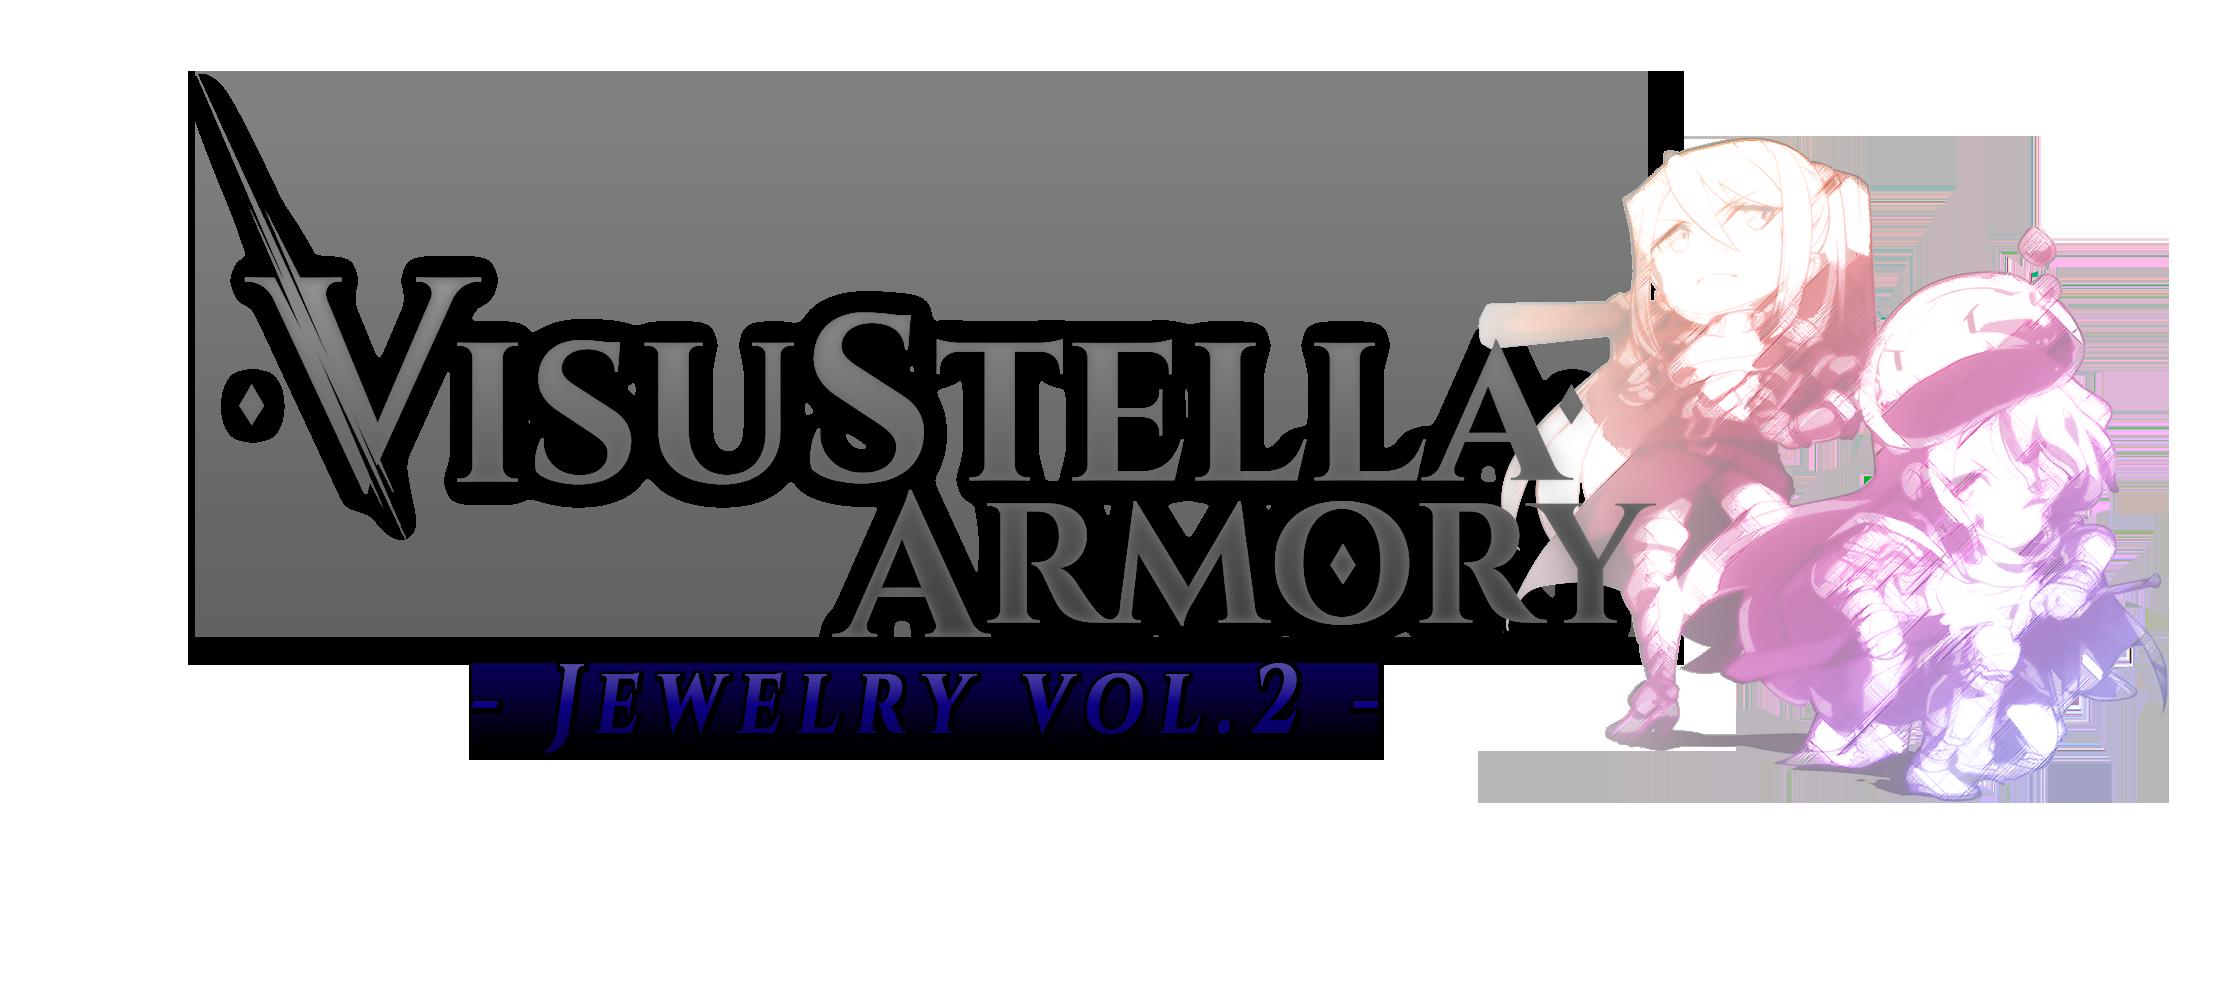 VisuStella Armory: Jewelry Vol.02